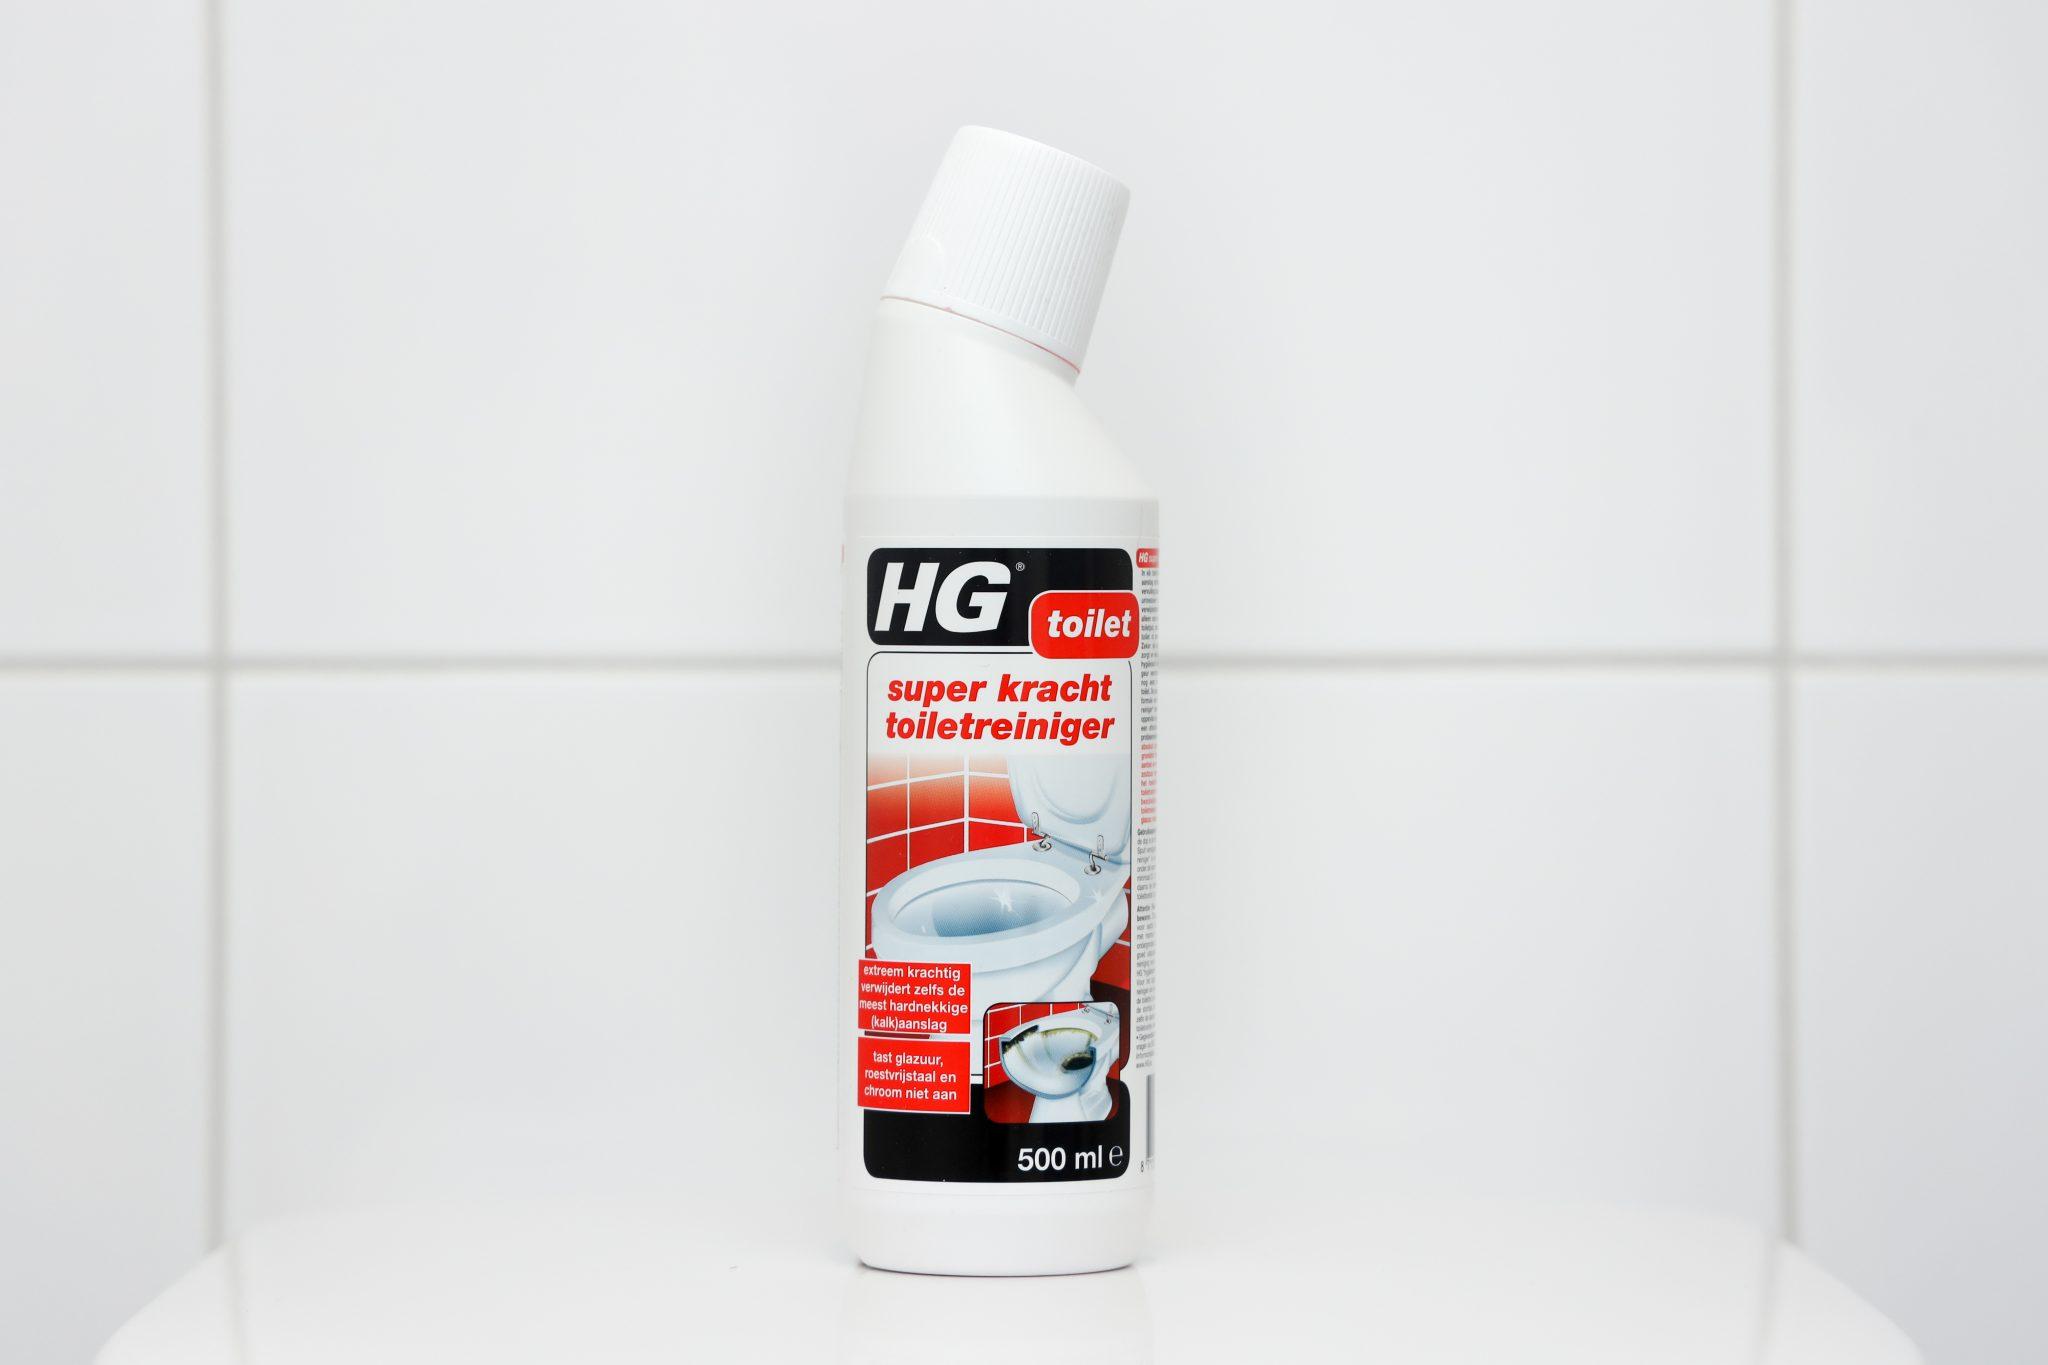 HG superkracht toiletreiniger